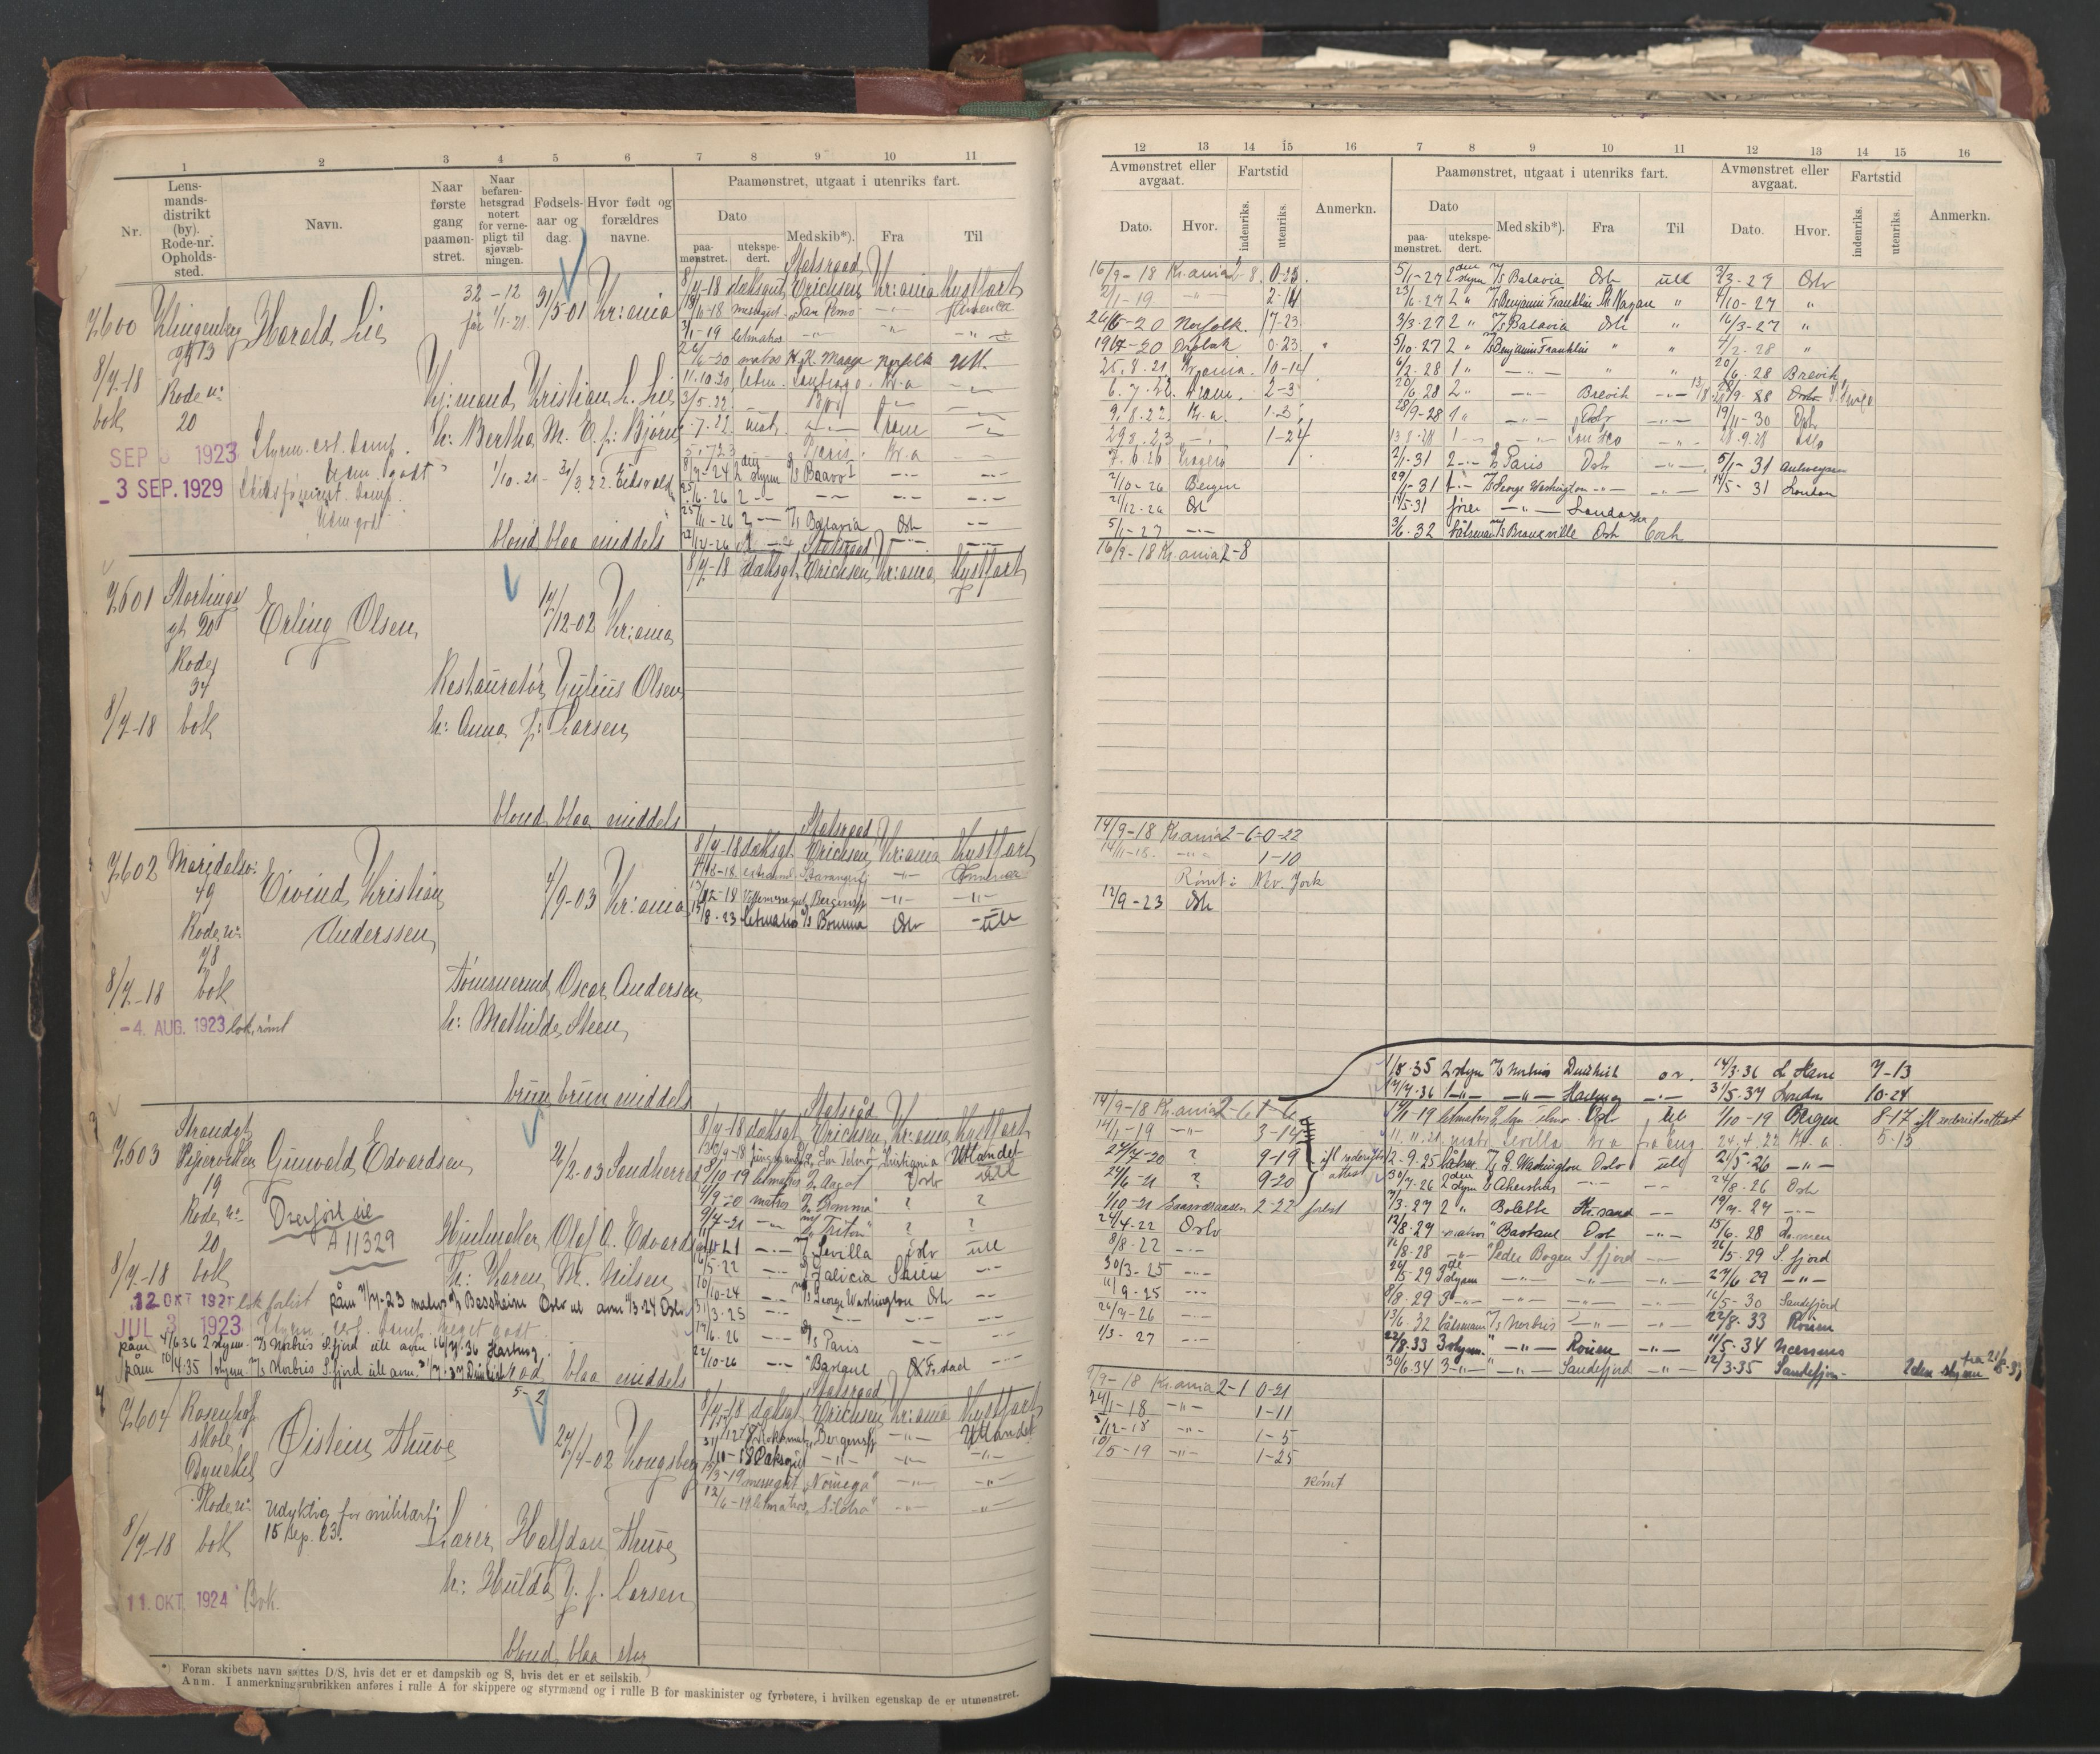 SAO, Oslo sjømannskontor, F/Fc/L0006: Hovedrulle, 1918-1930, s. 7